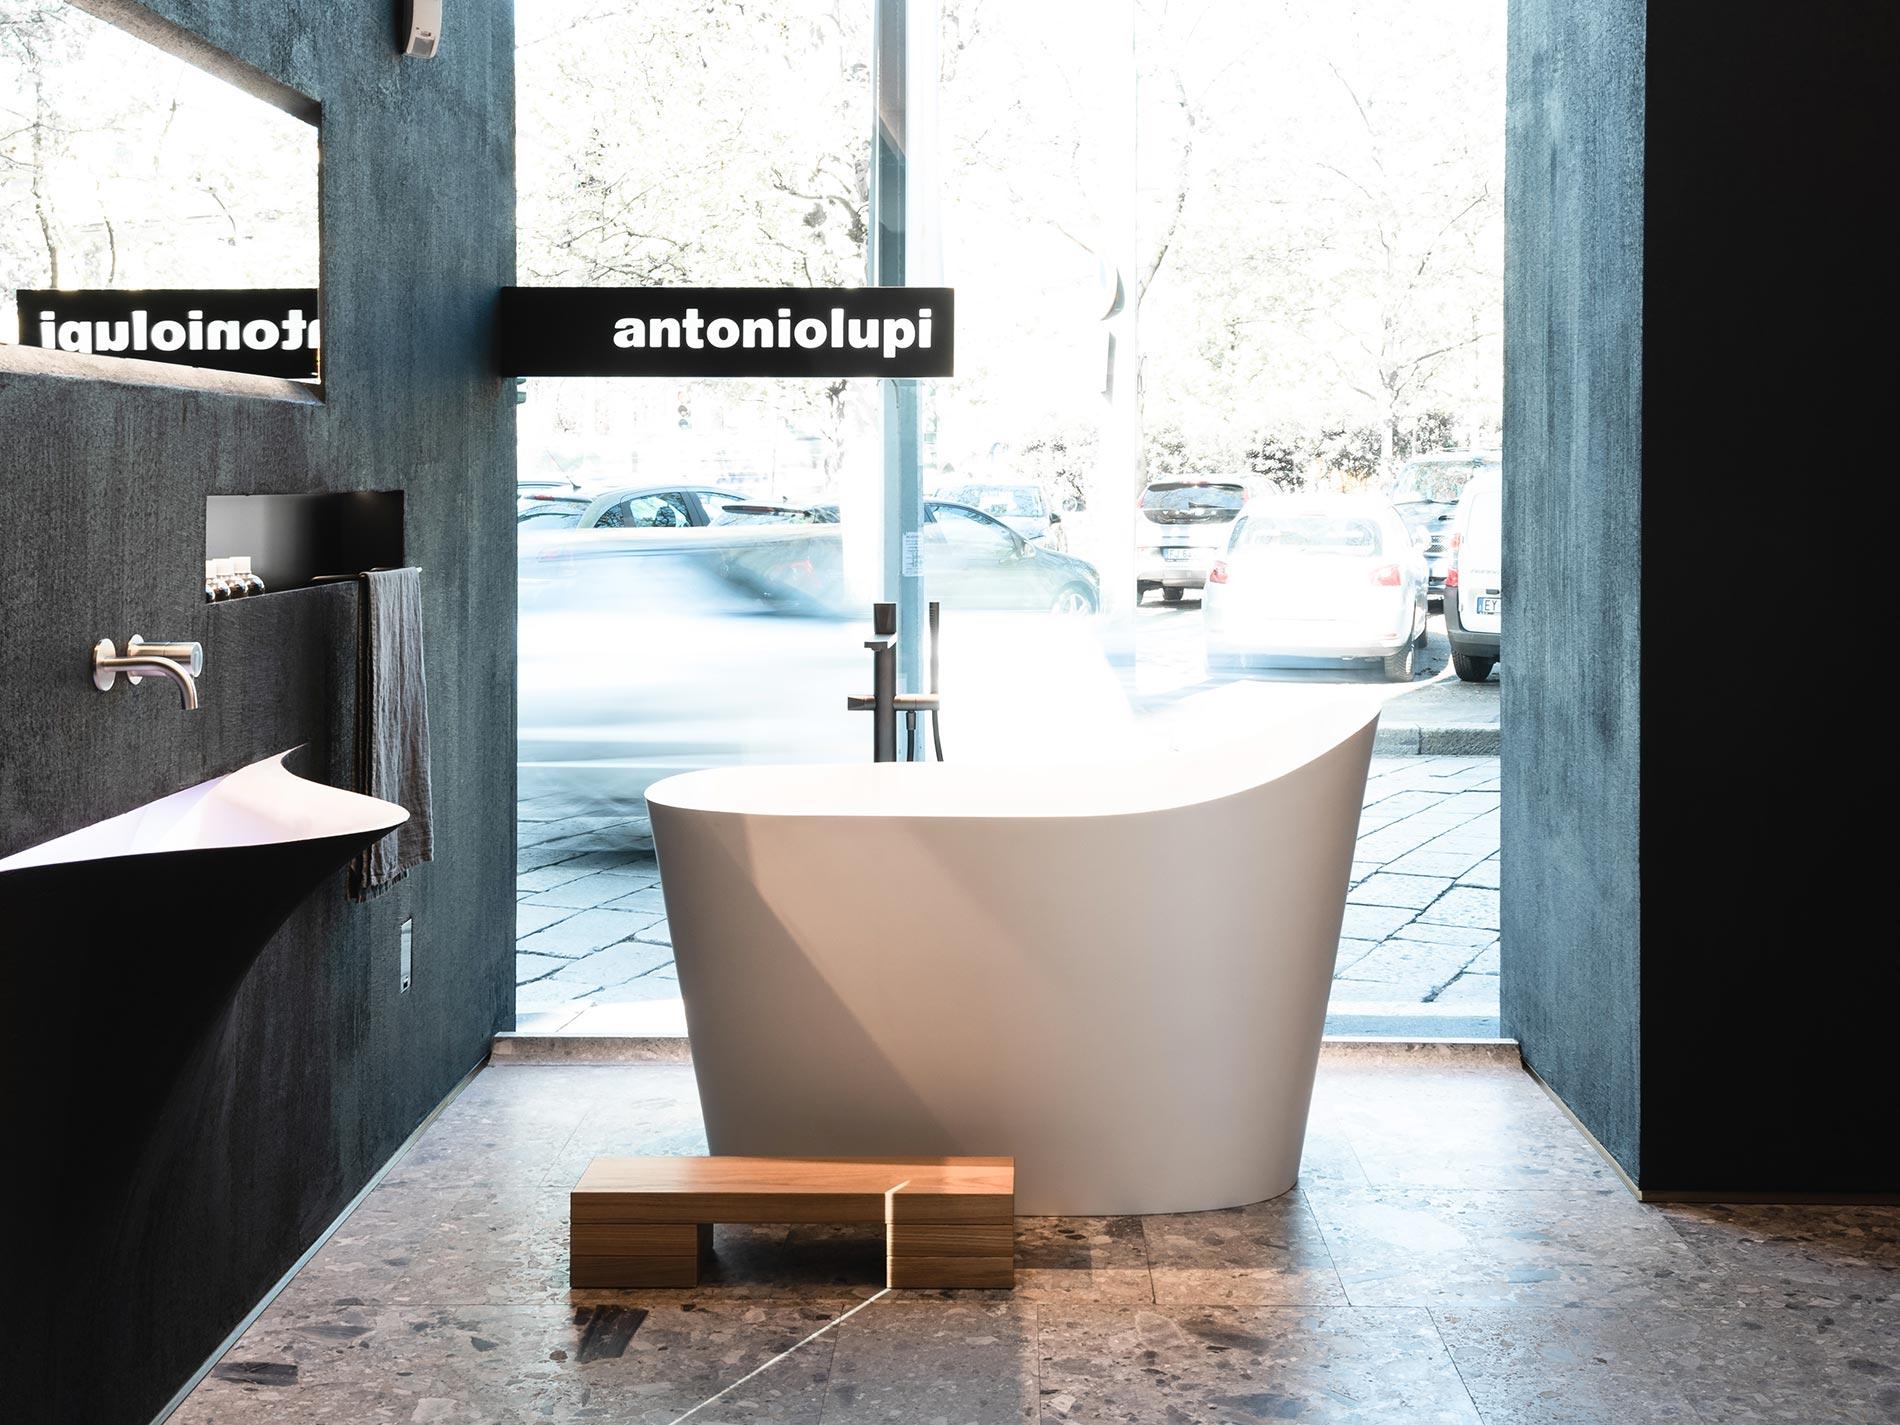 interpretazioni di una vasca freestanding, antoniolupi